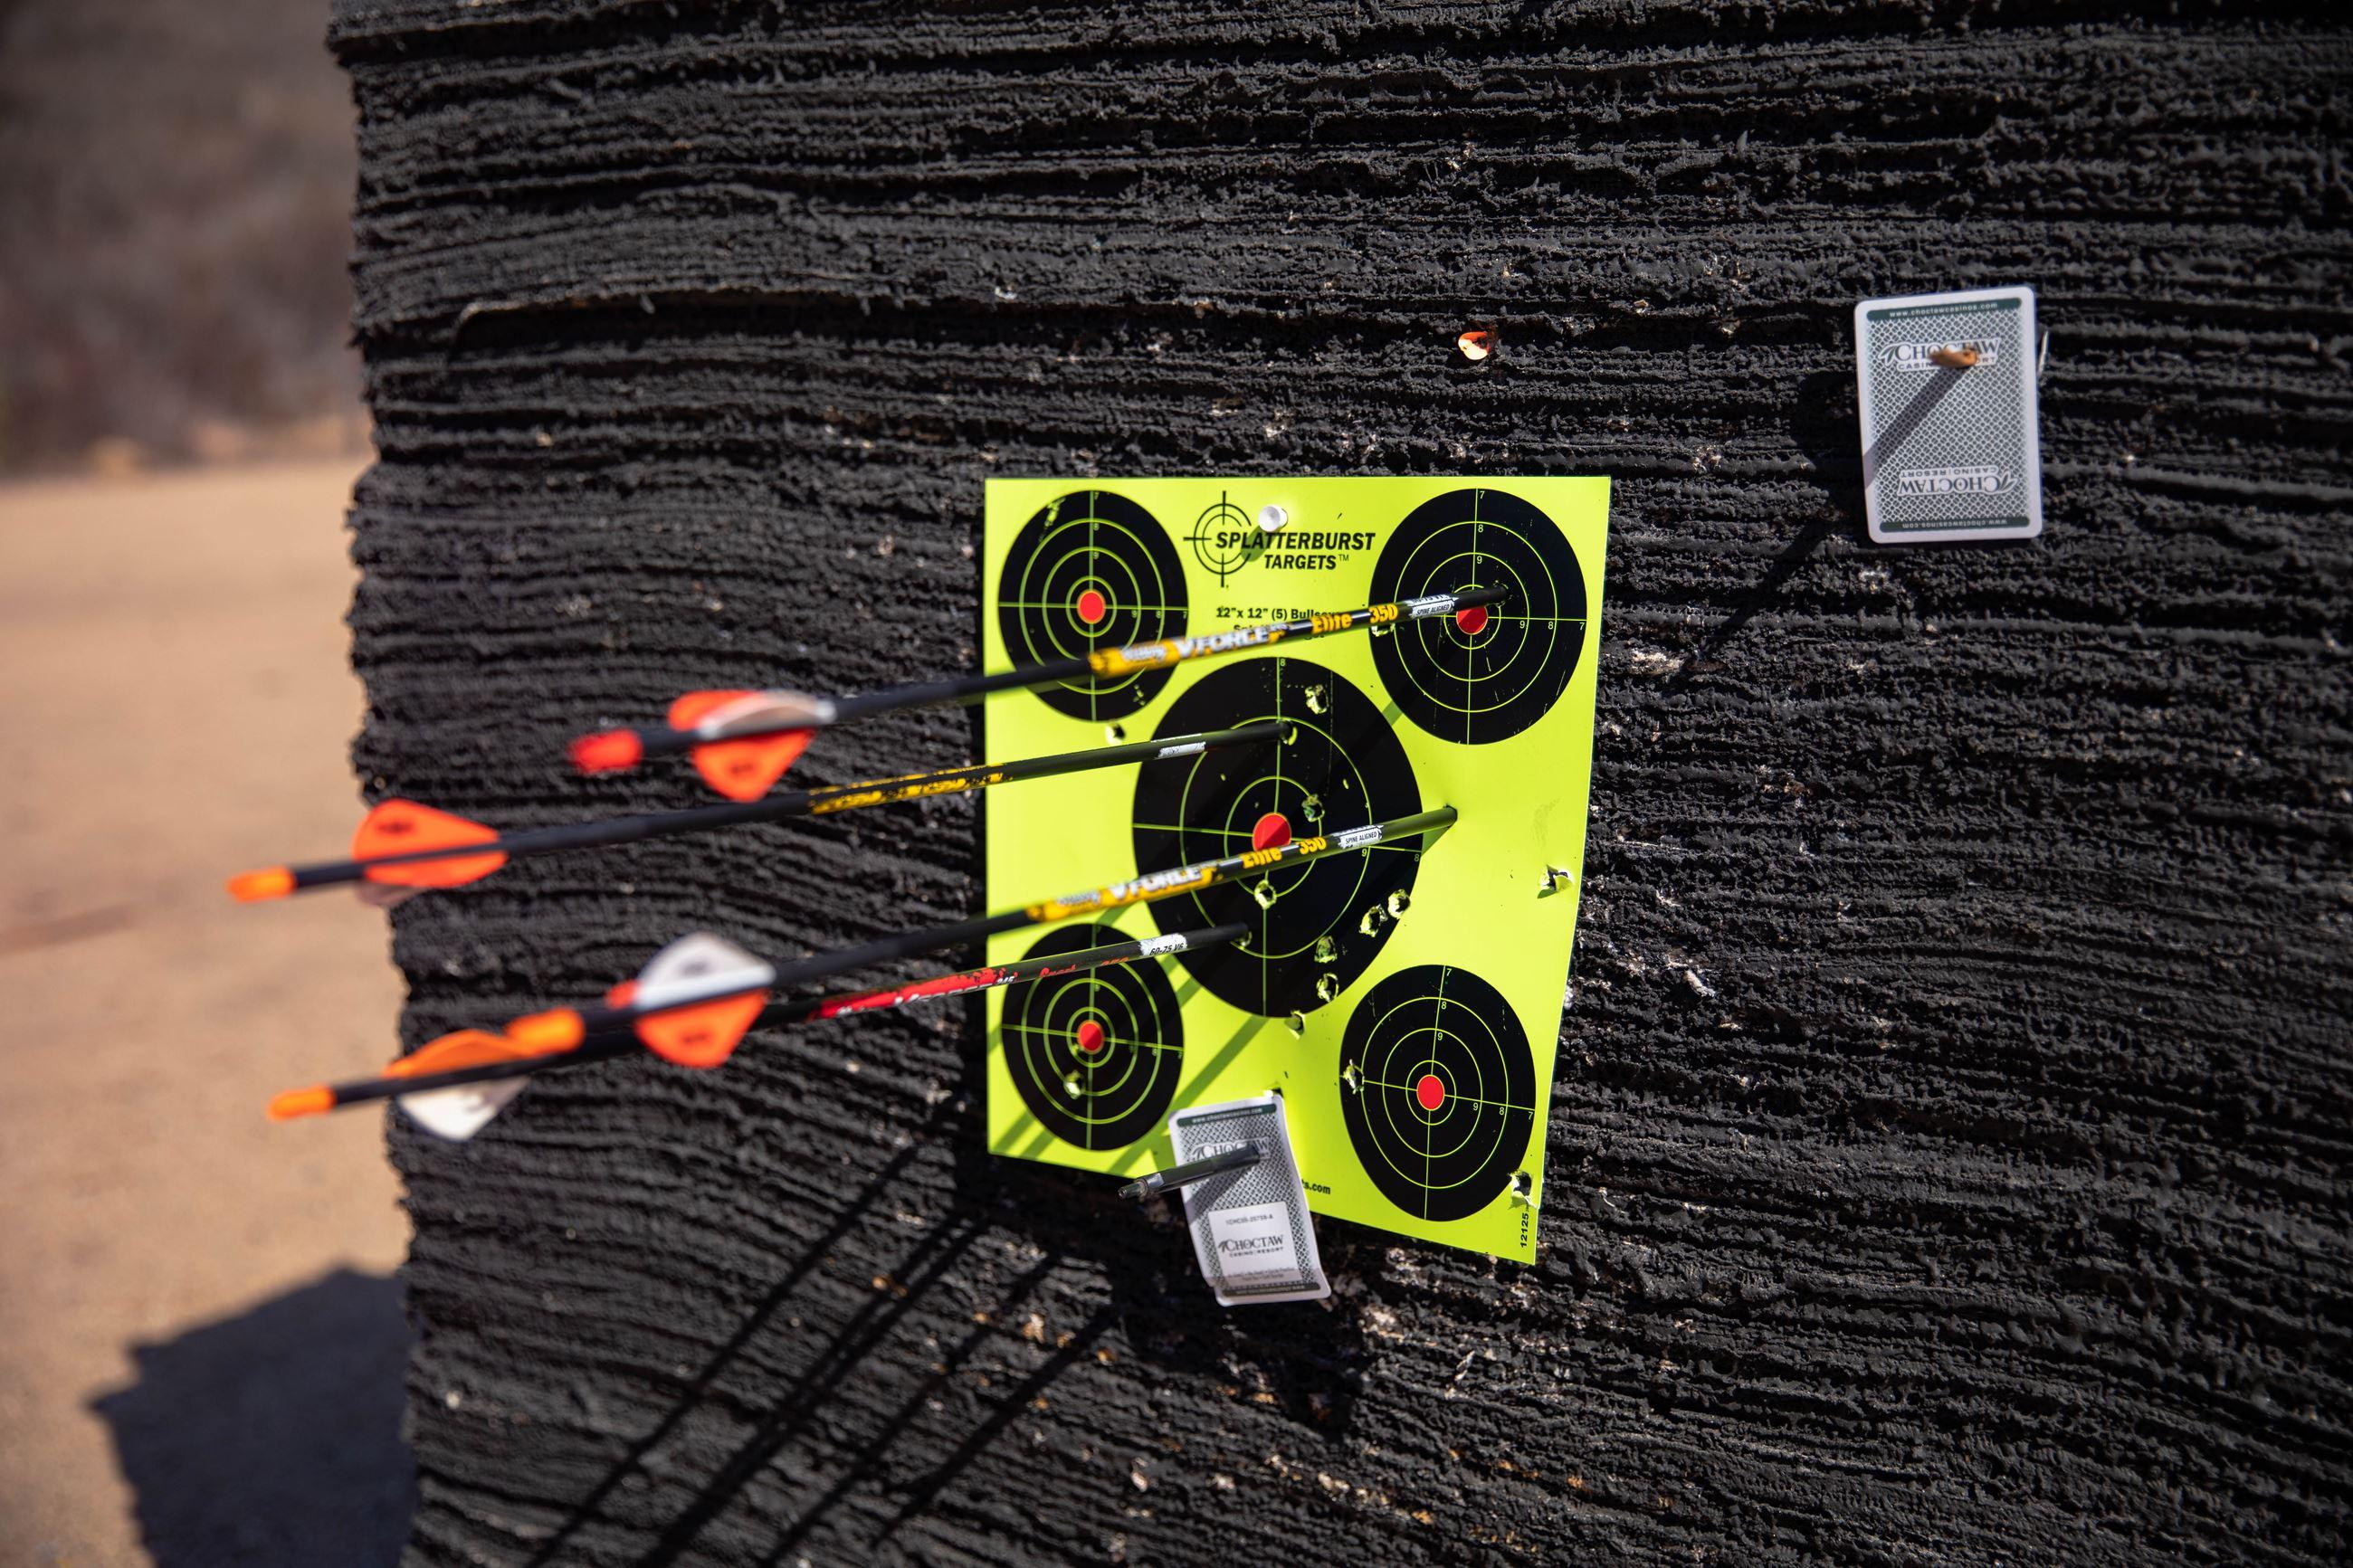 Archery Range | Poway, CA - Official Website